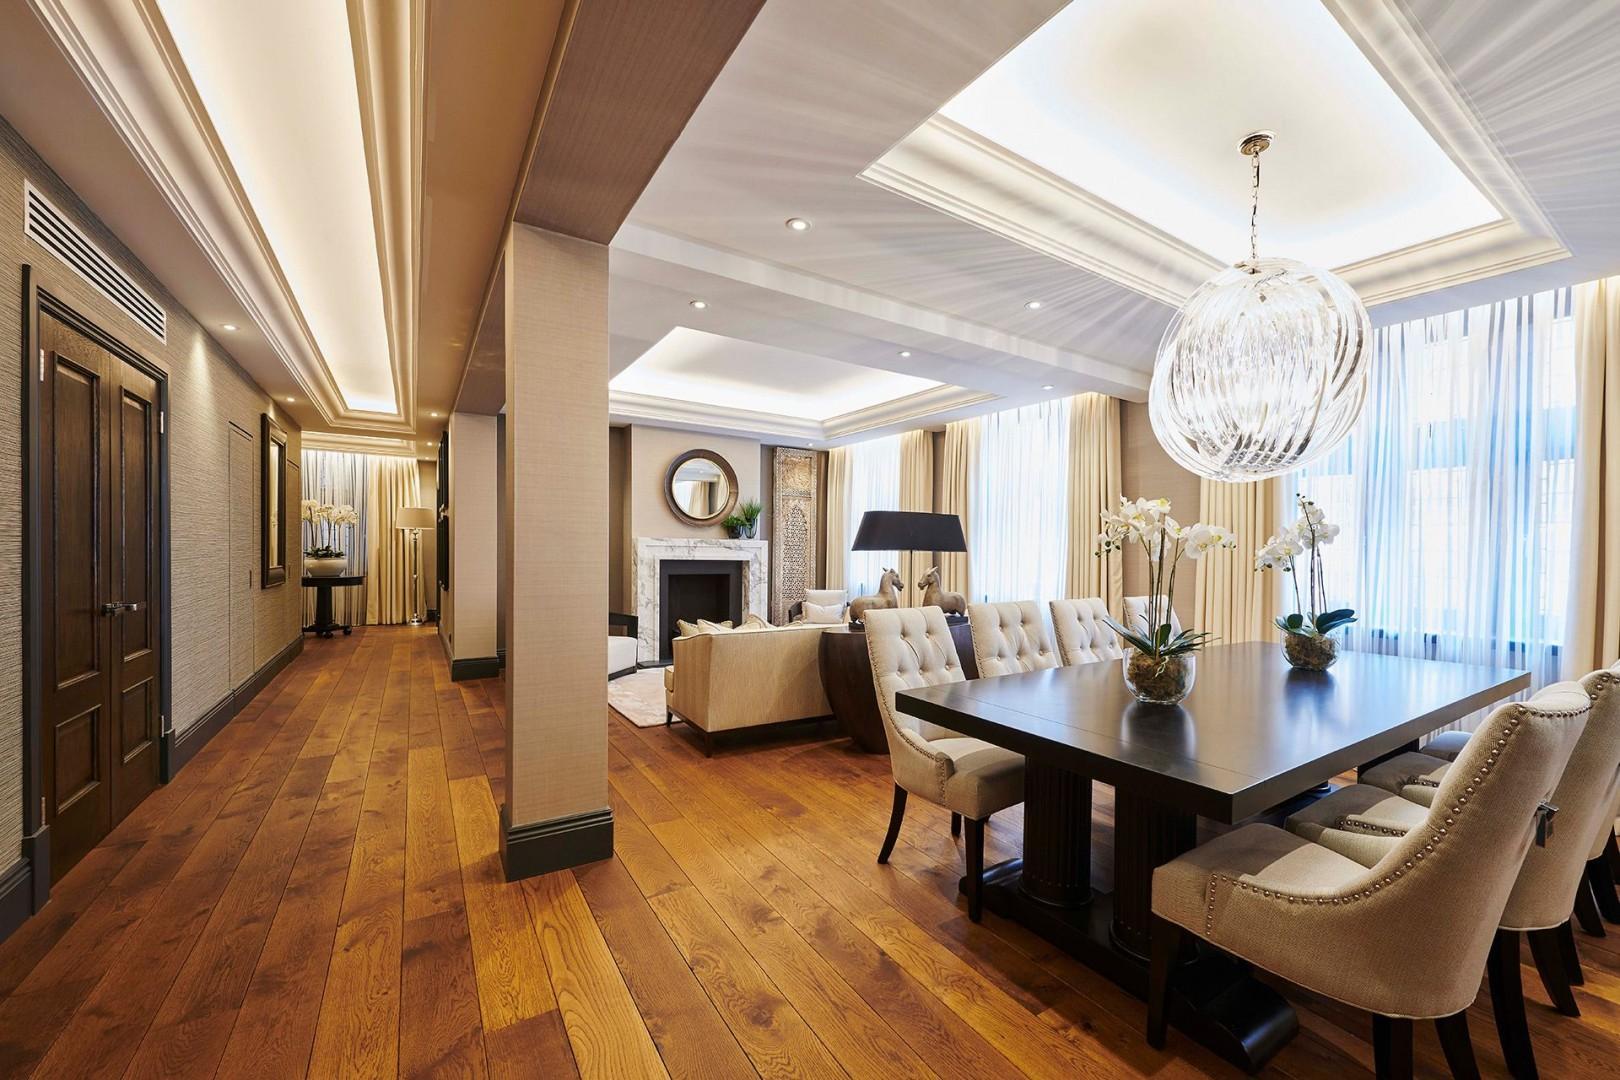 Follow the hallway to three gorgeous bedrooms